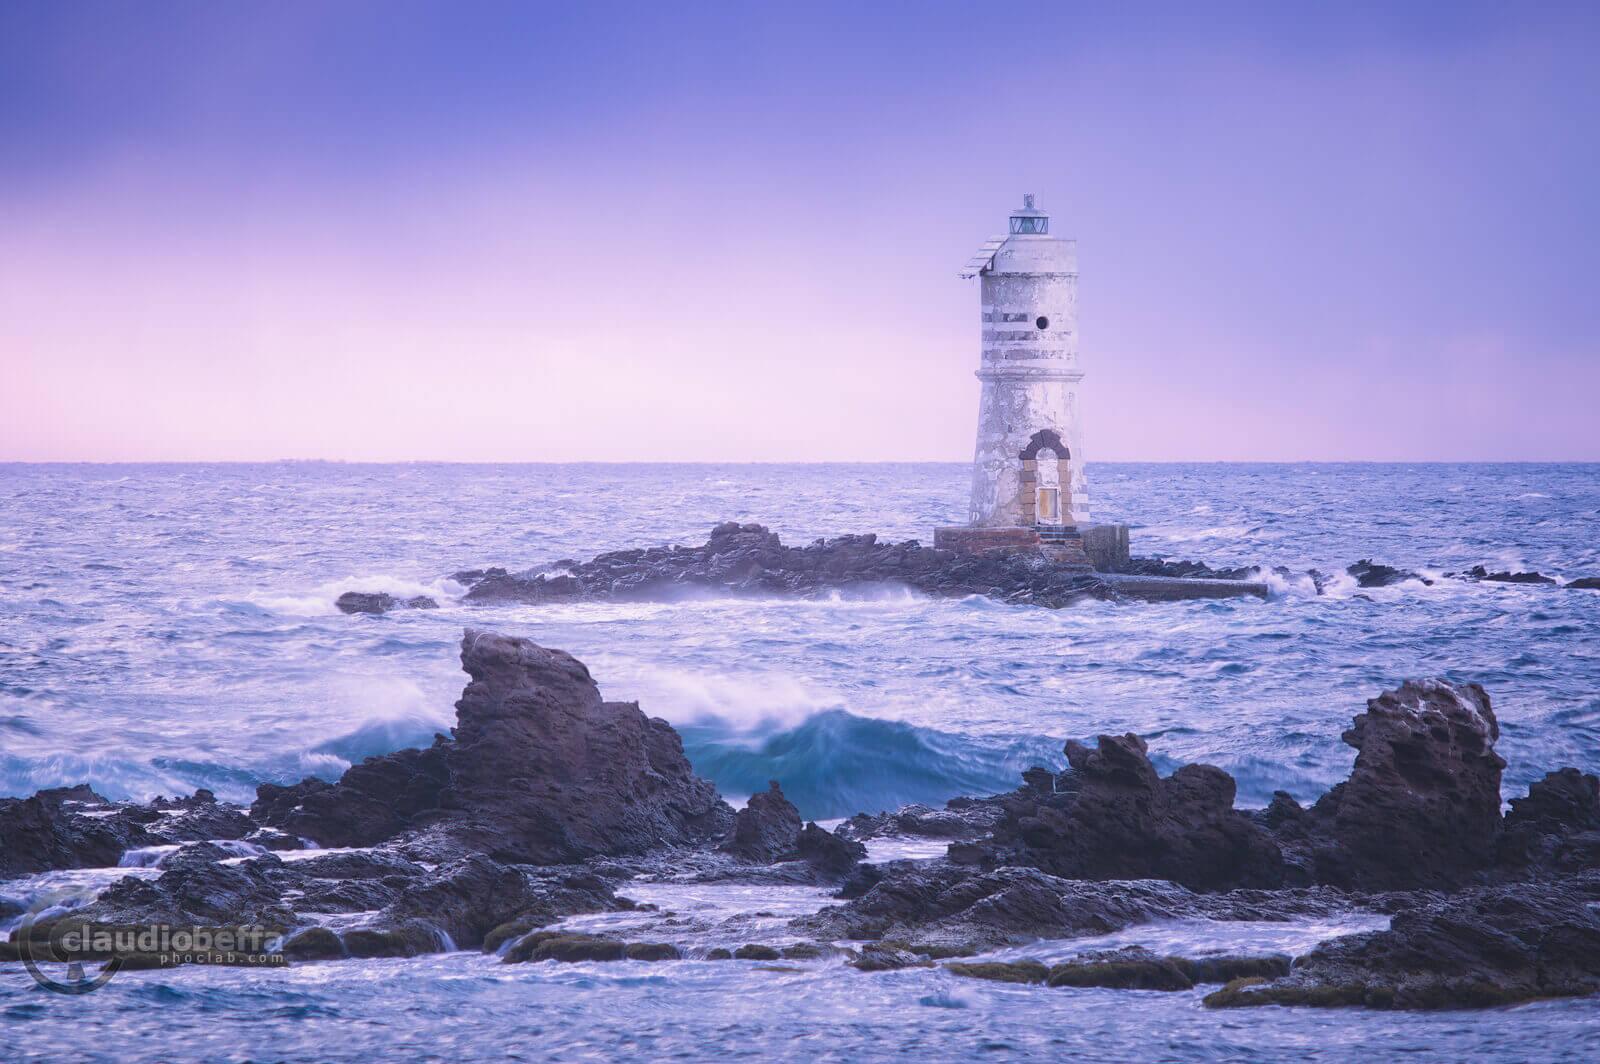 Mangiabarche blue hour, sardinia, italy, landscape, seascape, sea, lighthouse, waves, blue hour, rocks, spikes